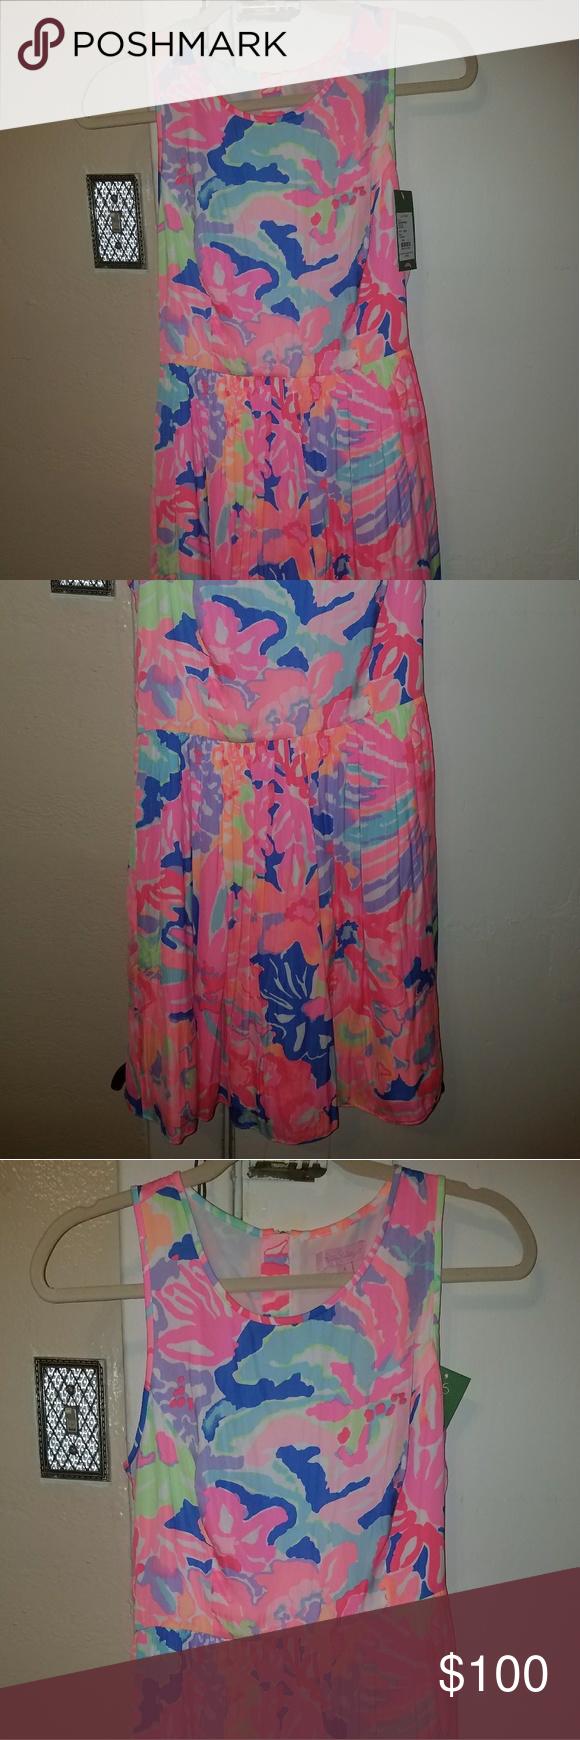 ae3468da979399 Kassia dress going coastal size 4 Lilly pulitzer Nwt Lilly Pulitzer Dresses  Midi